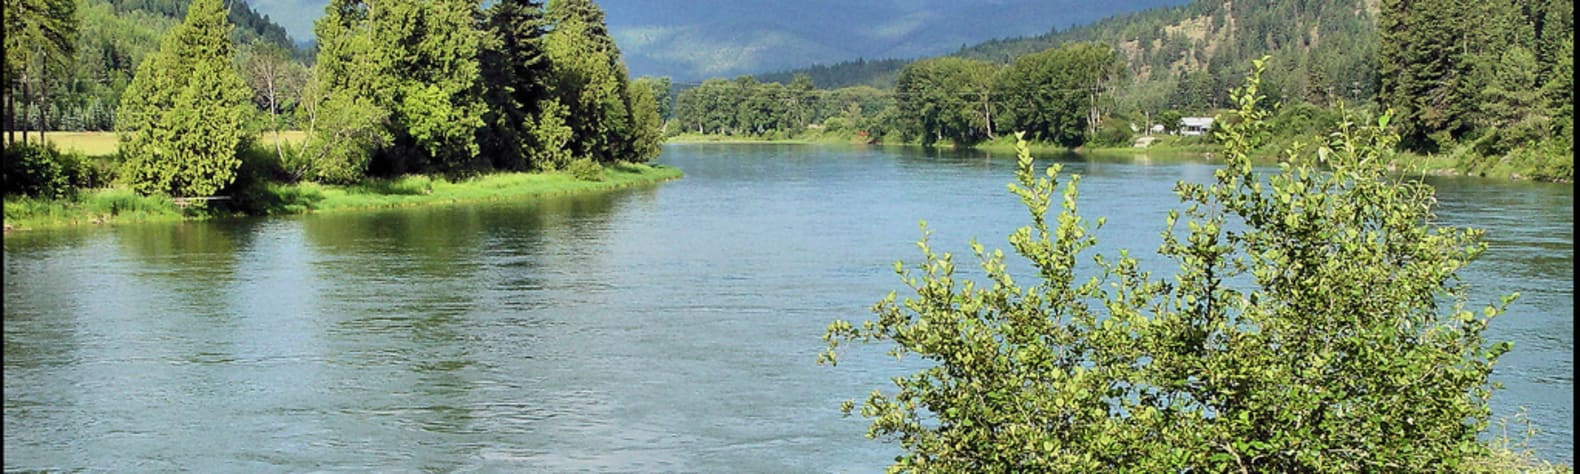 Libby Dam and Lake Koocanusa Park